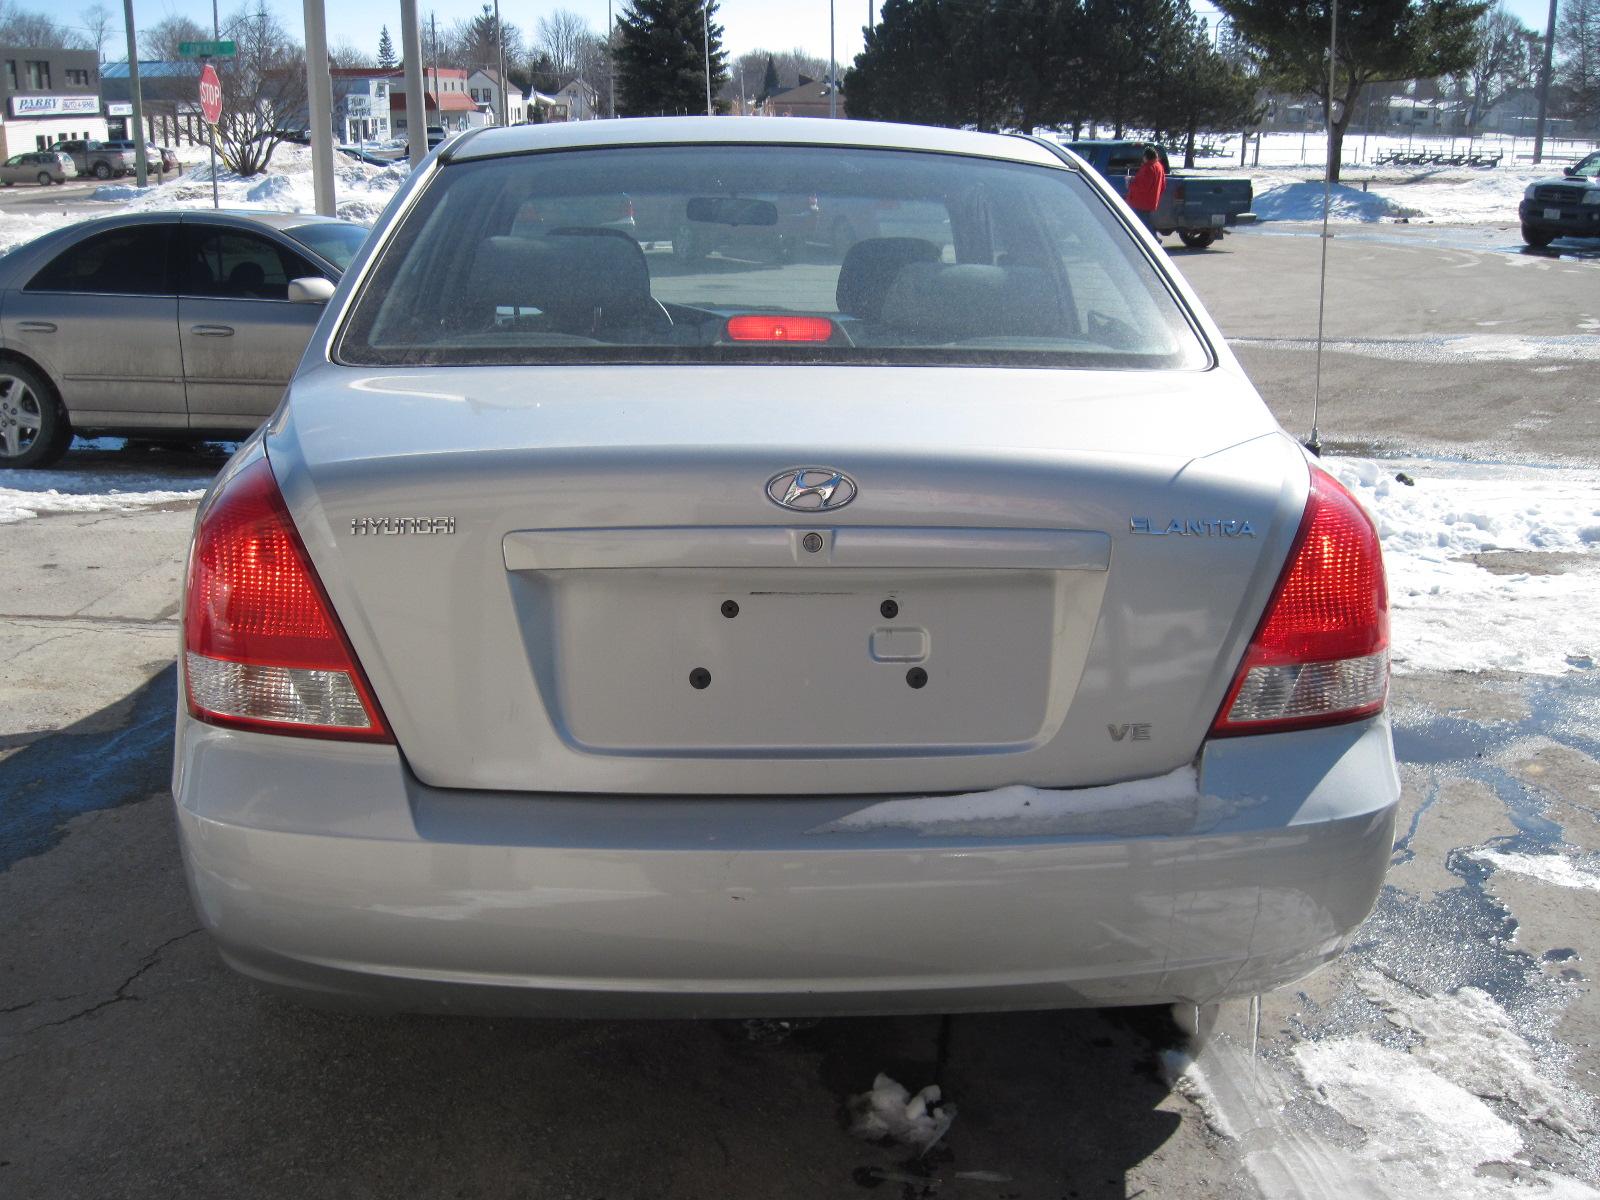 Used 2002 Hyundai Elantra in Orillia,ON